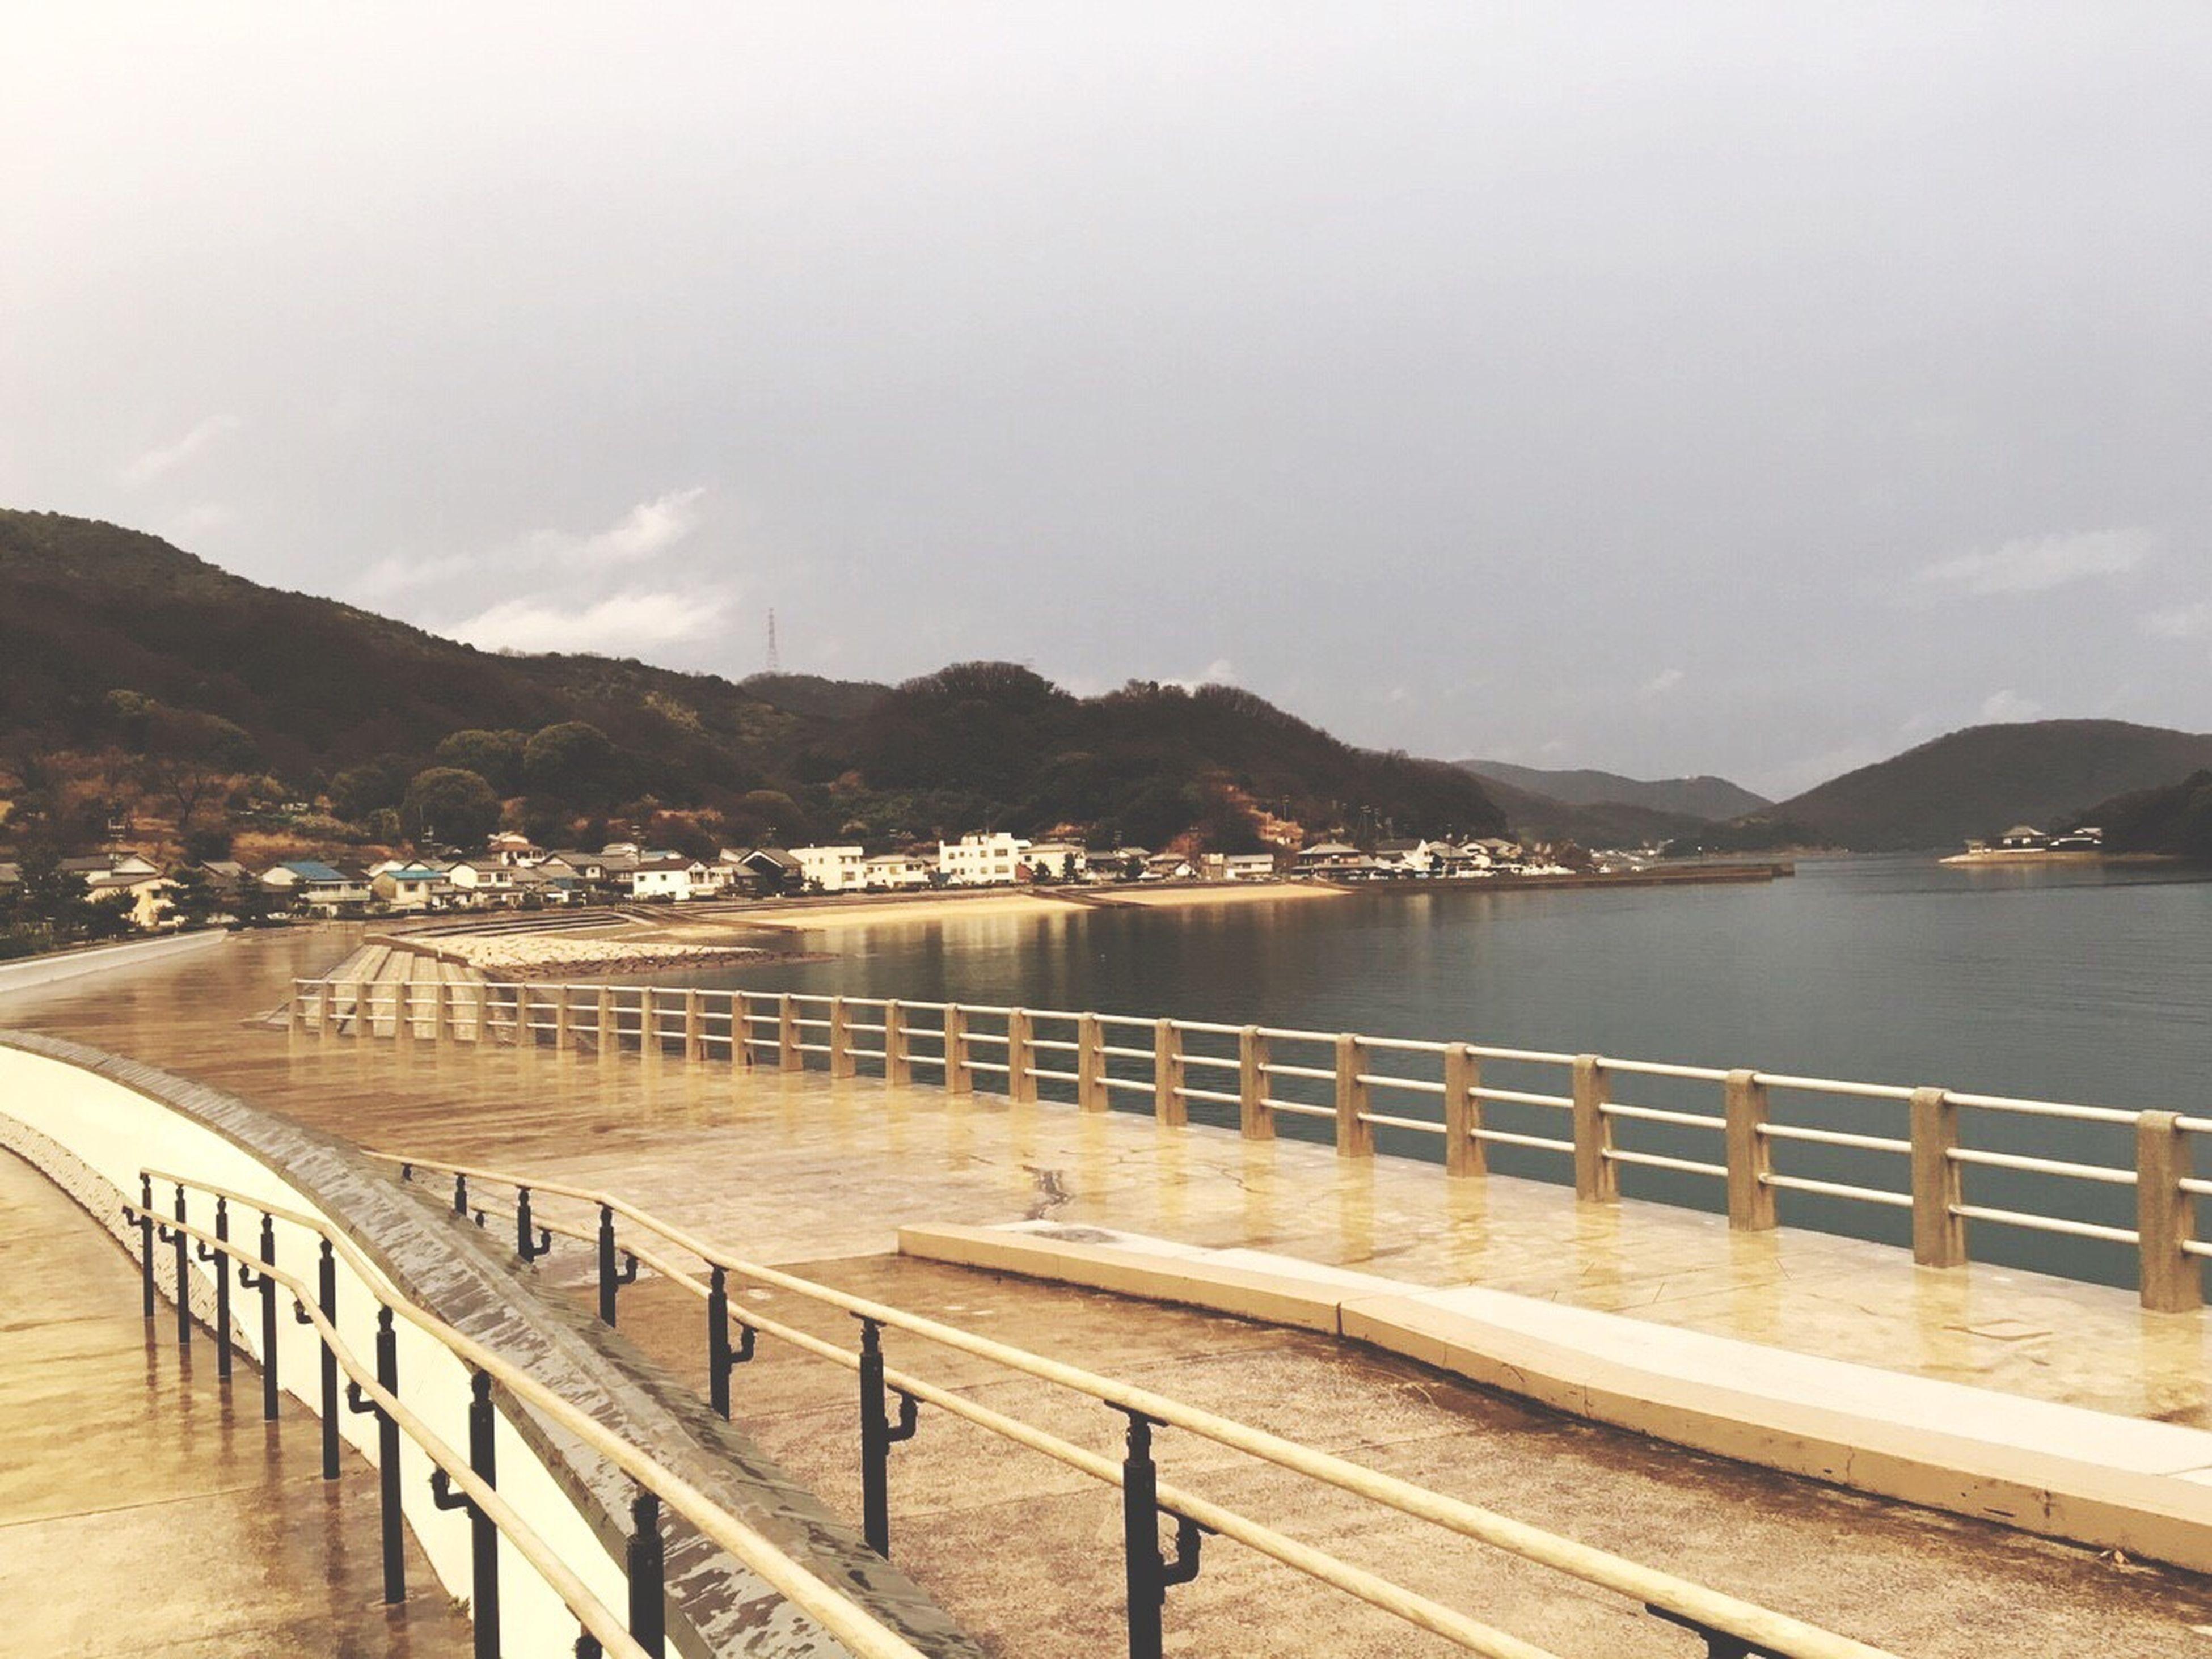 water, sea, mountain, railing, sky, pier, scenics, tranquil scene, tranquility, beauty in nature, nature, beach, mountain range, shore, built structure, cloud - sky, idyllic, jetty, outdoors, coastline